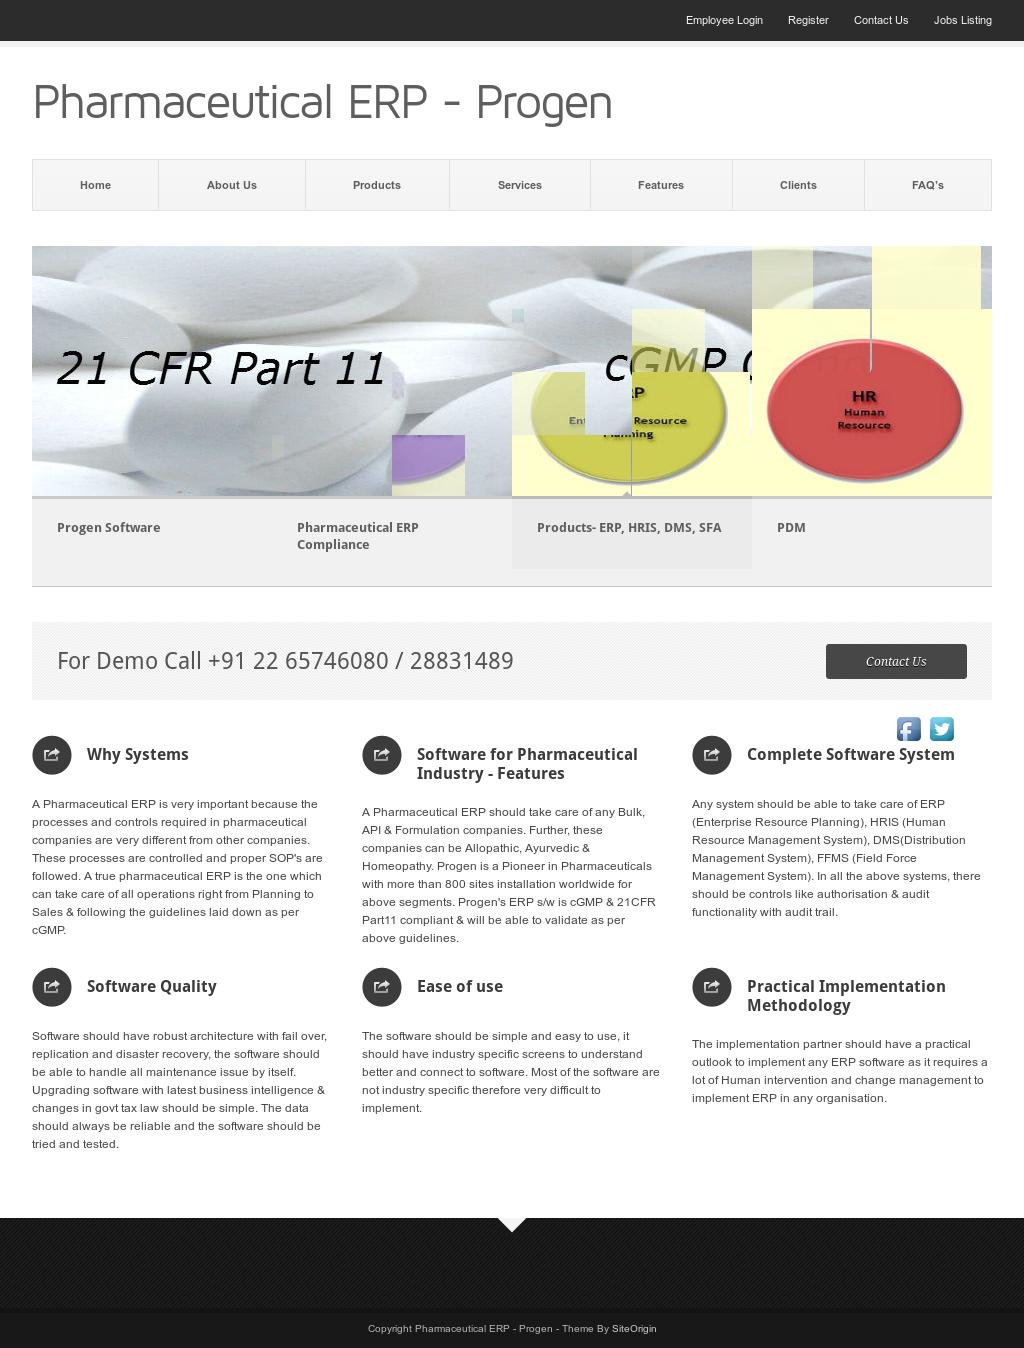 Pharmaceutical ERP - Progen Competitors, Revenue and